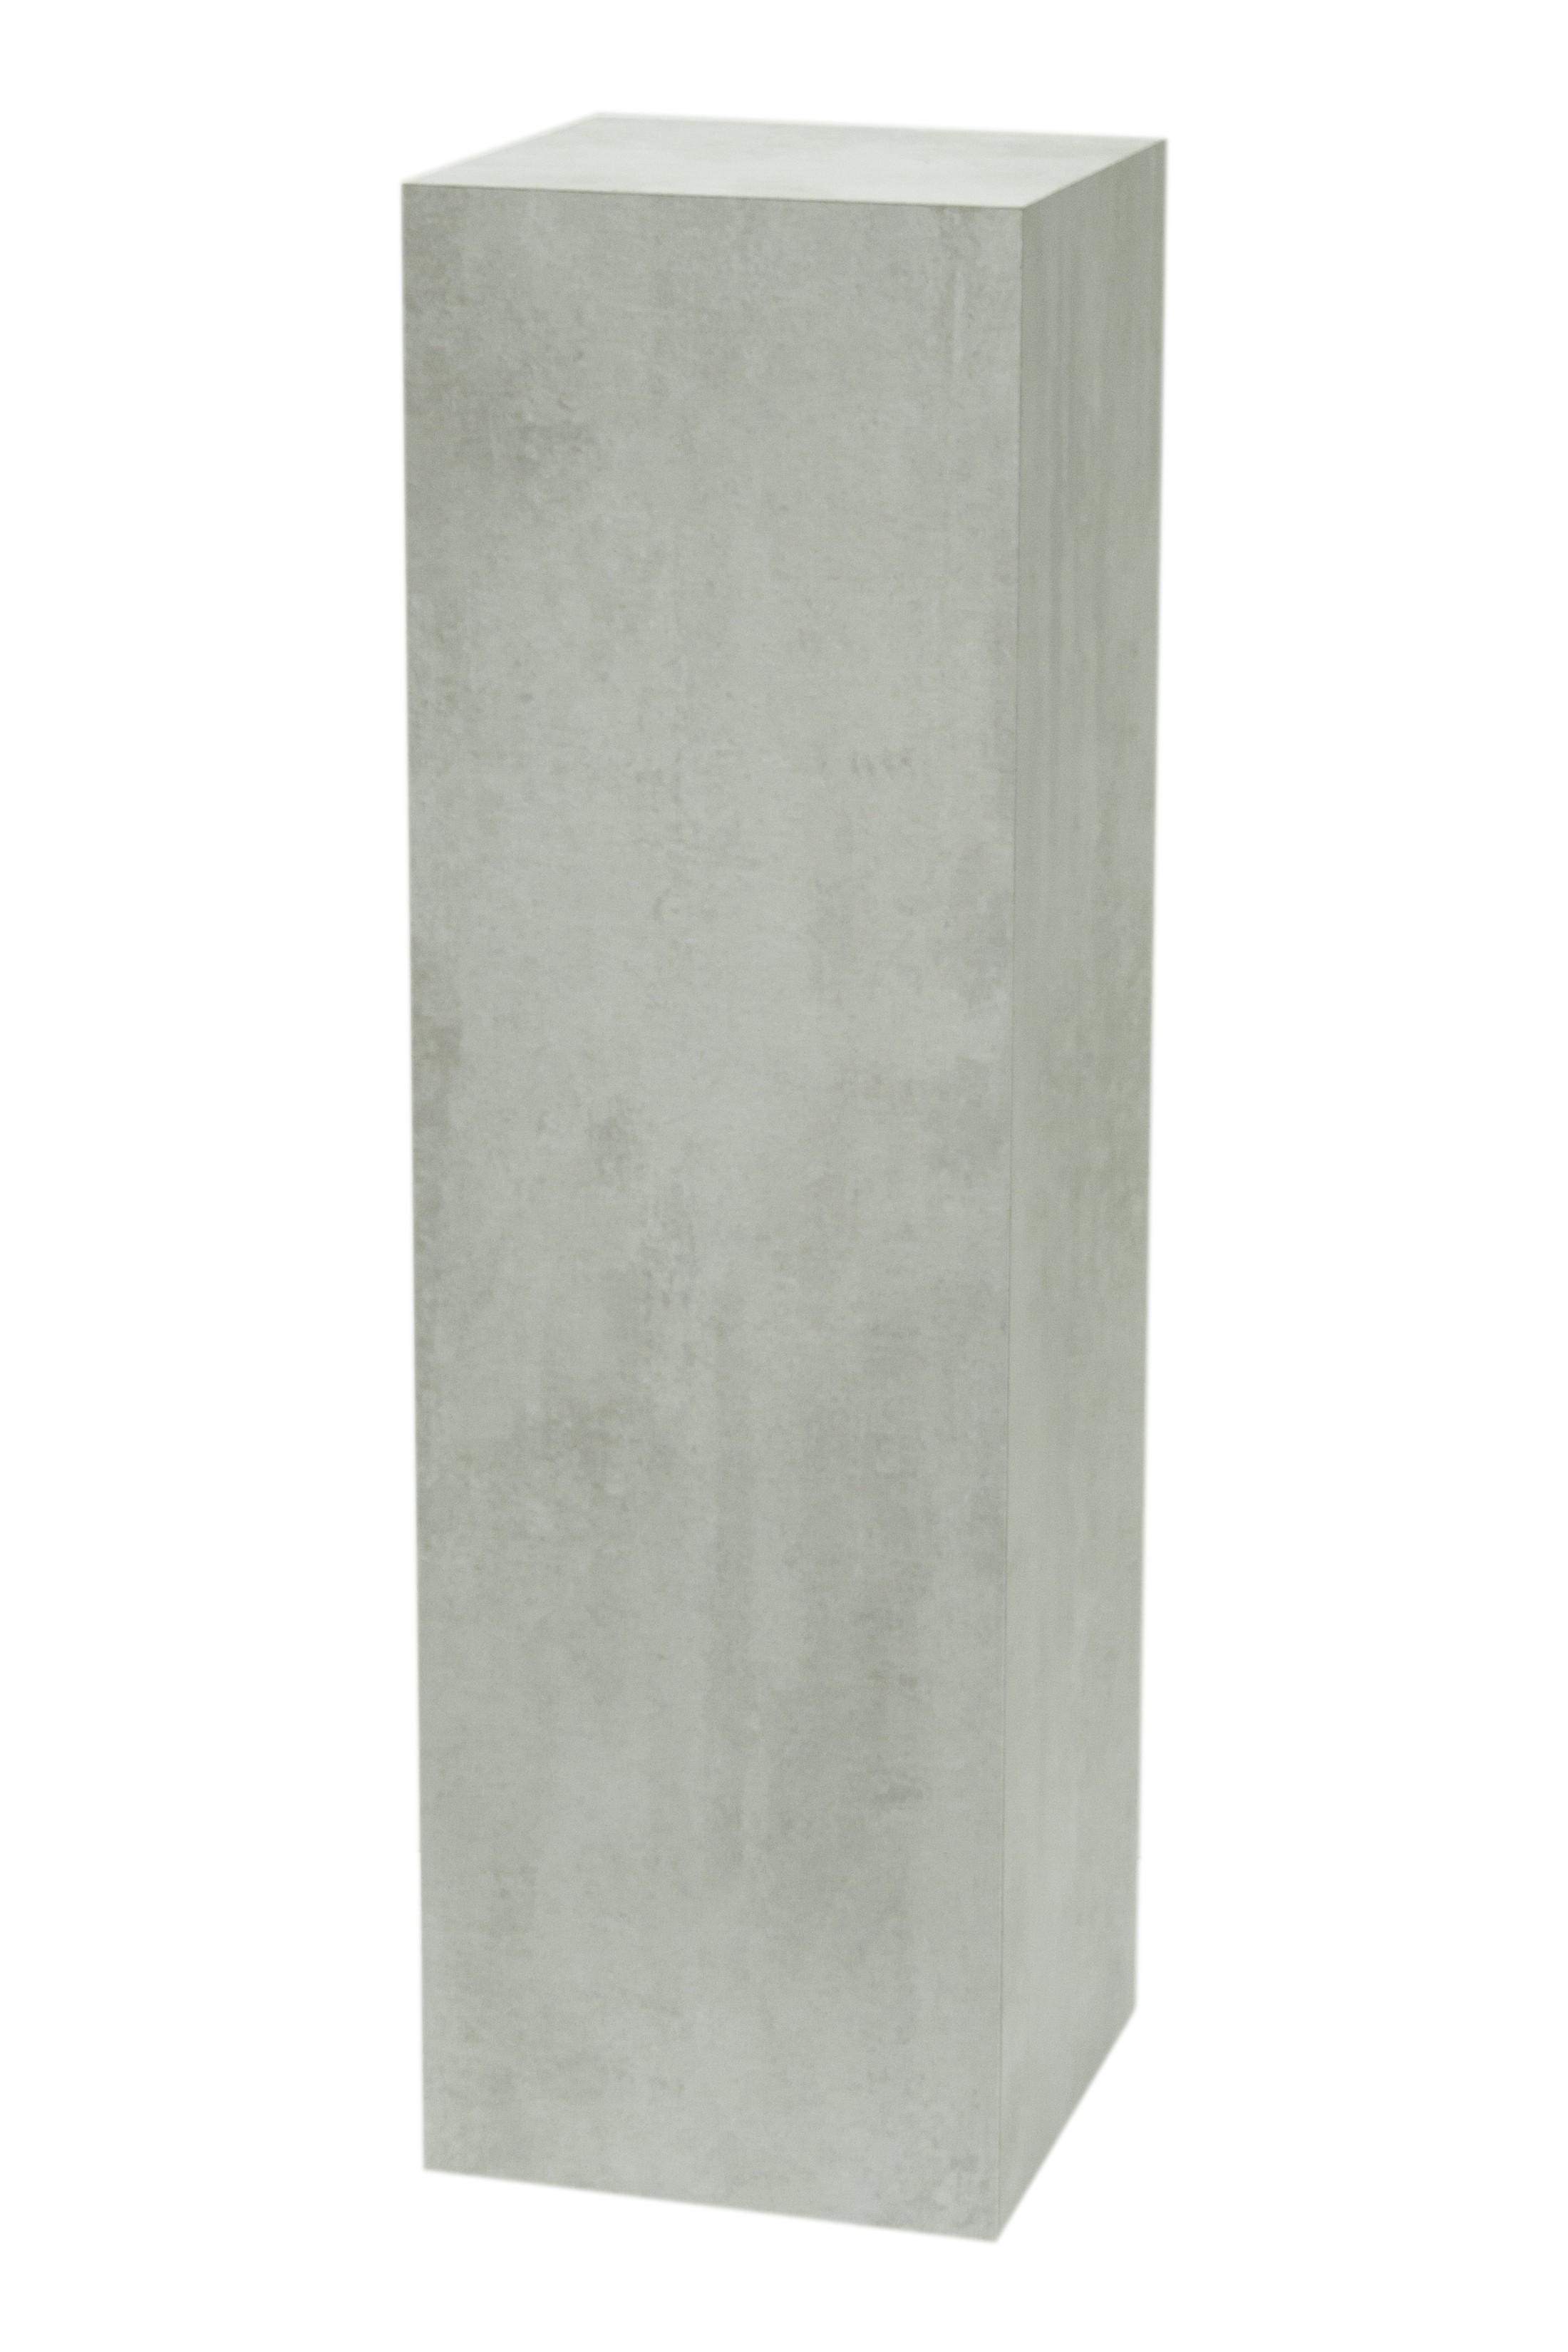 Solits pidestall betonglook